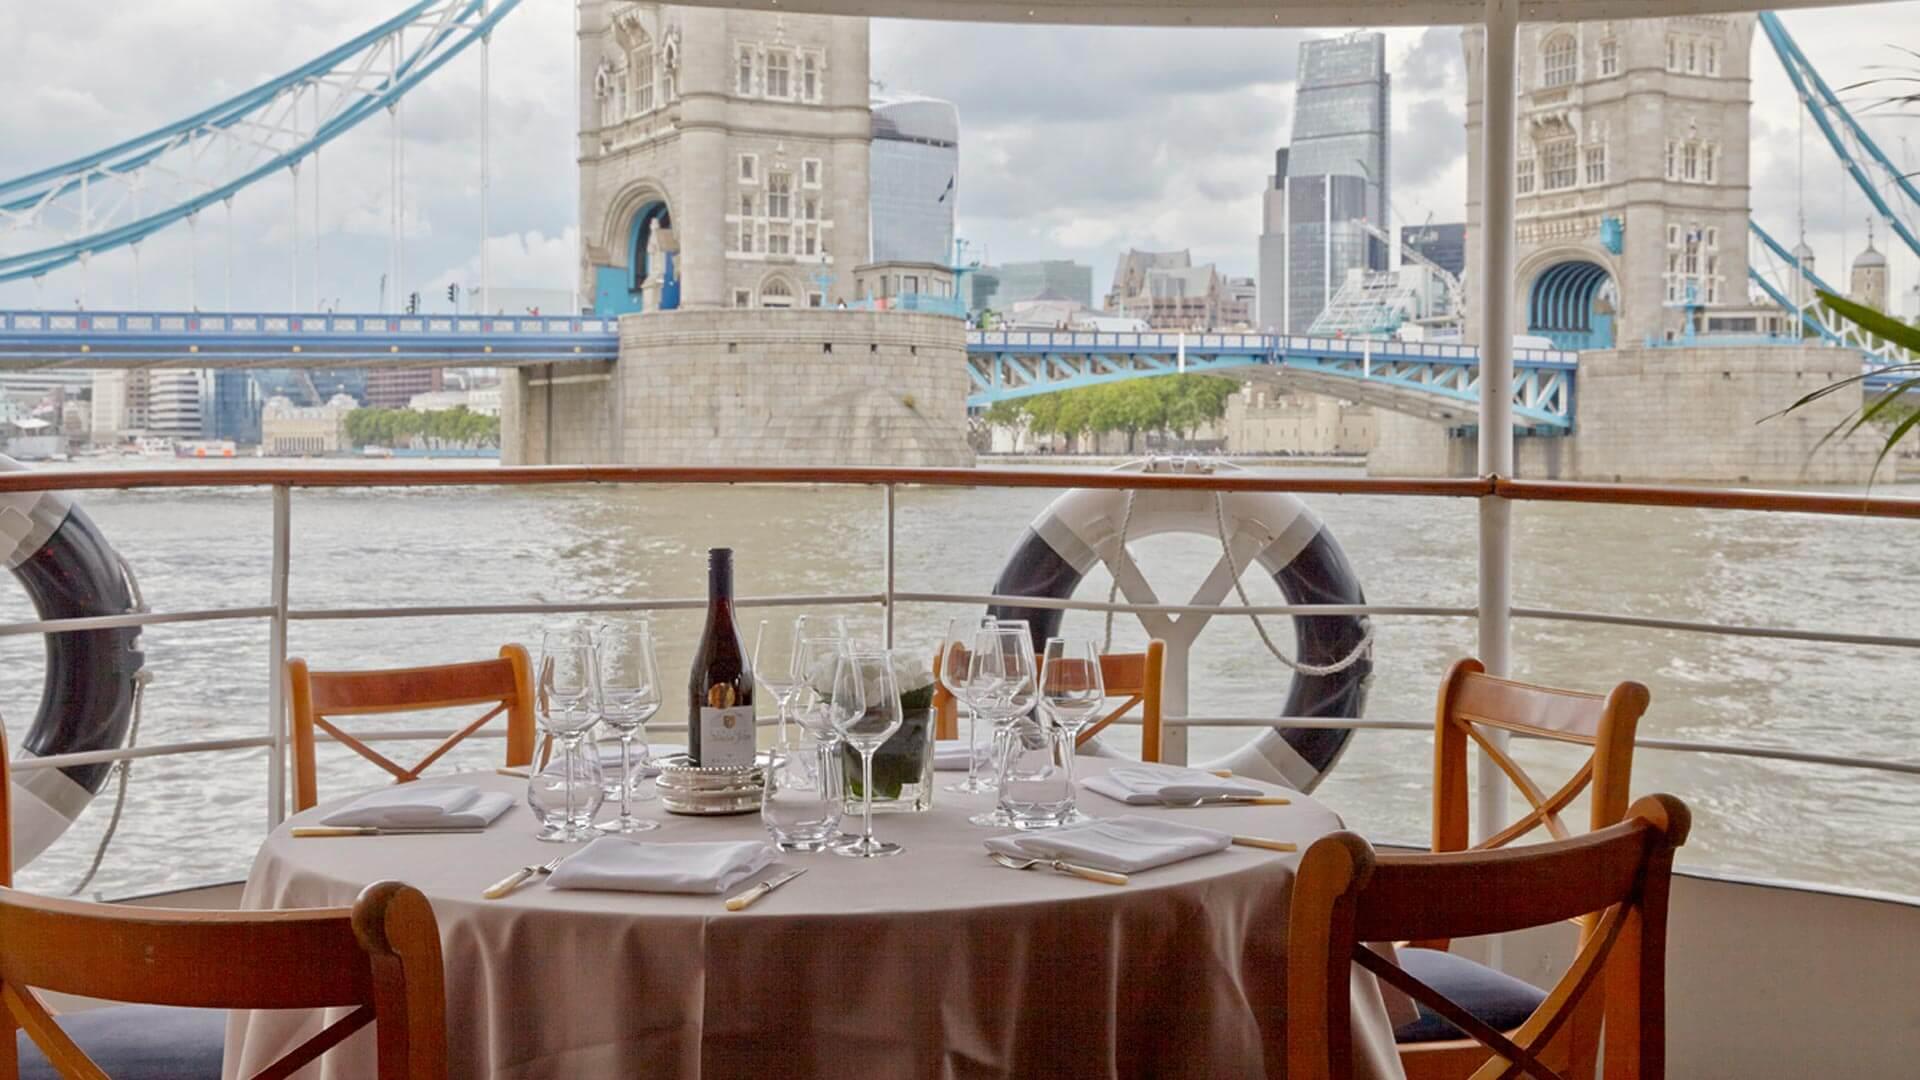 Edwardian Luxury London Party Boat Hire Fleet Thames